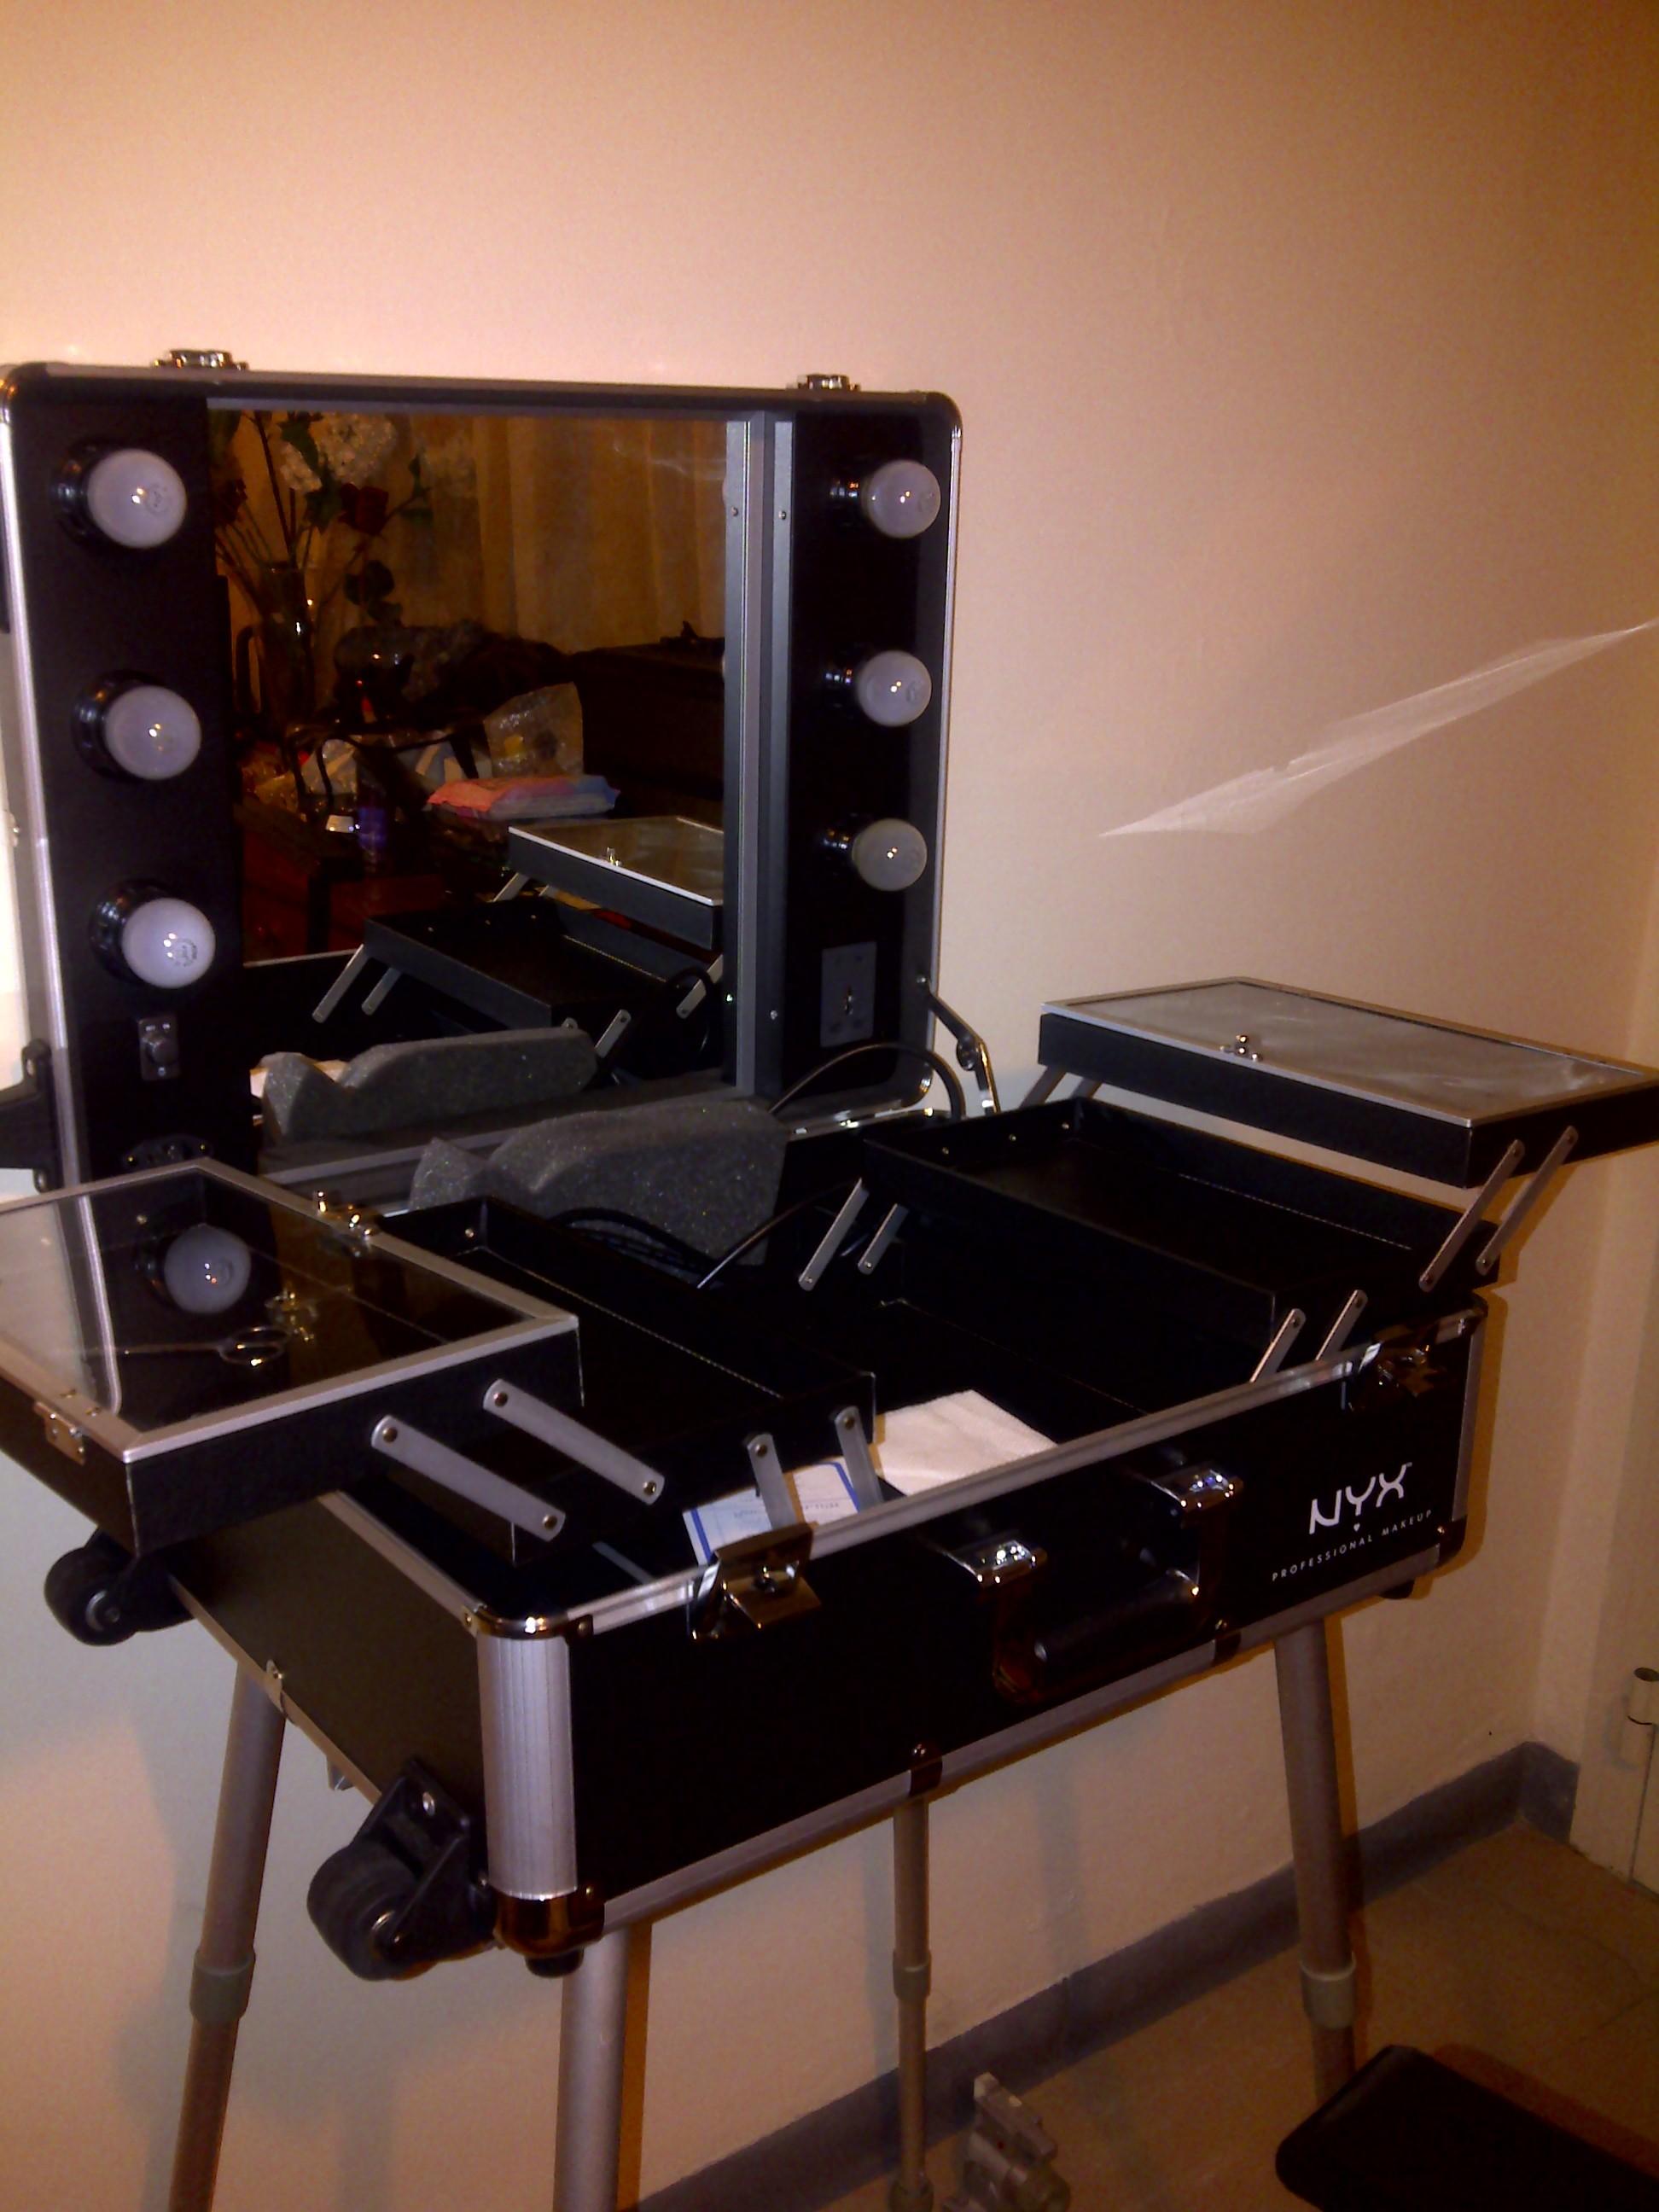 professional makeup chair uk swing pod nyx vidalondon